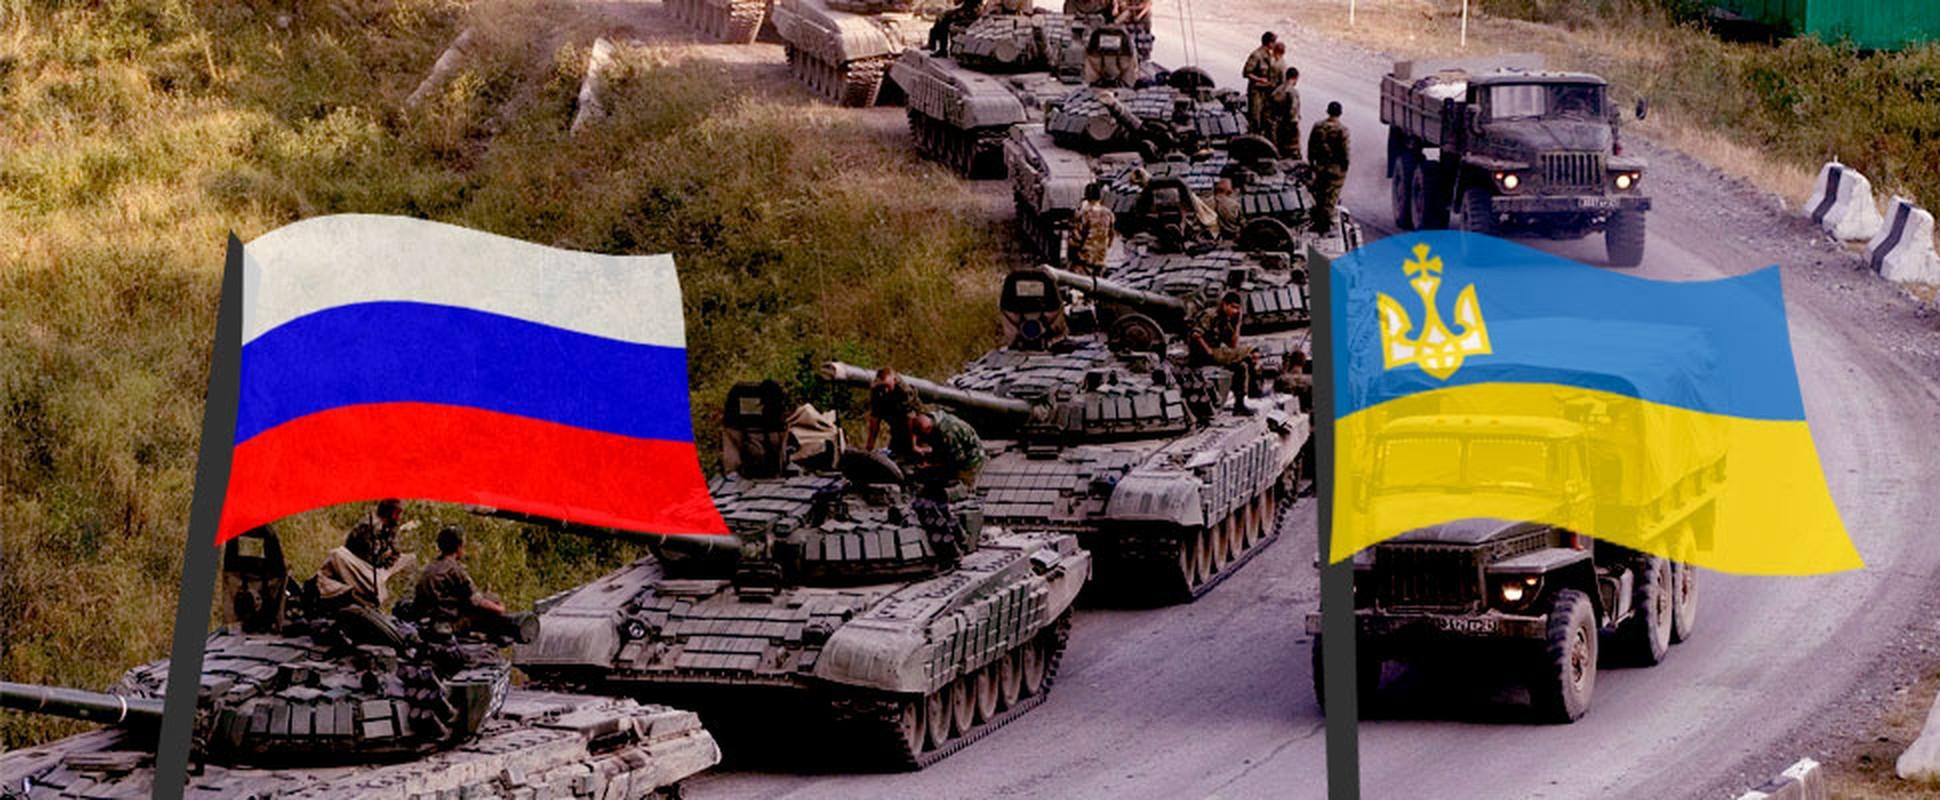 Noi la lam Nga dua ten lua dan dao nguy hiem toi sat Ukraine